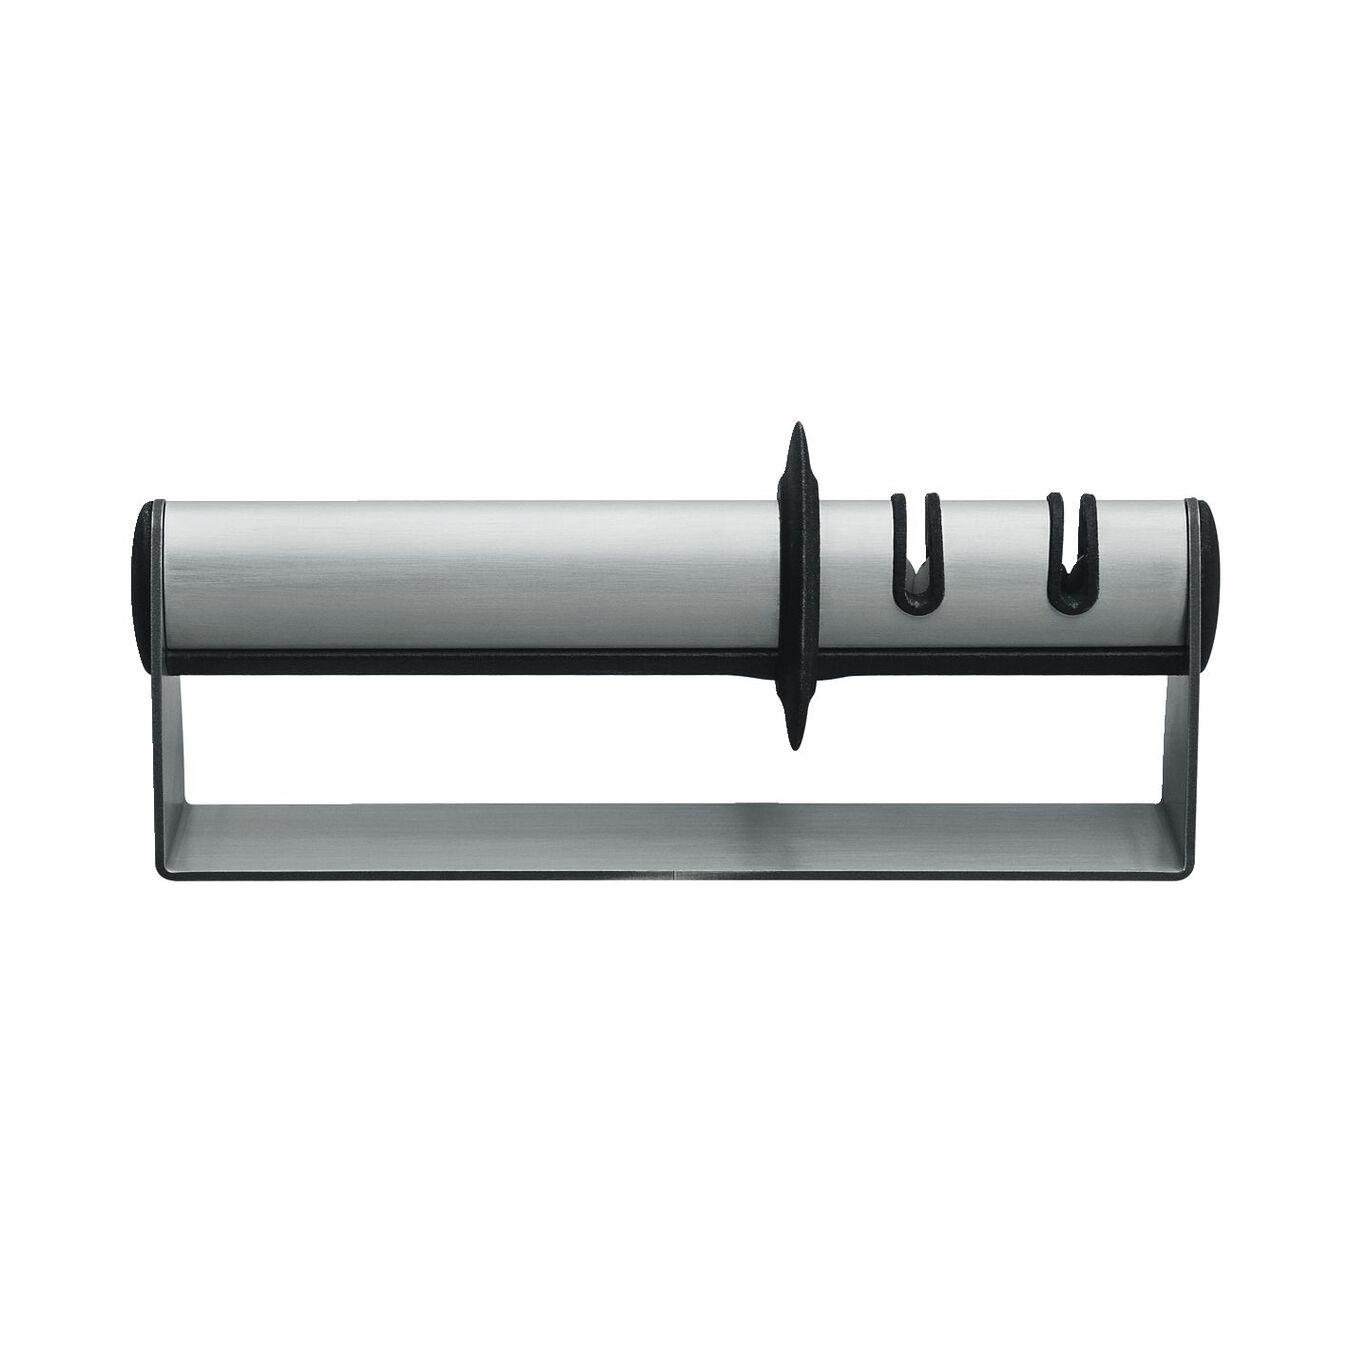 TWINSHARP Duo Stainless Steel Handheld Knife Sharpener,,large 1